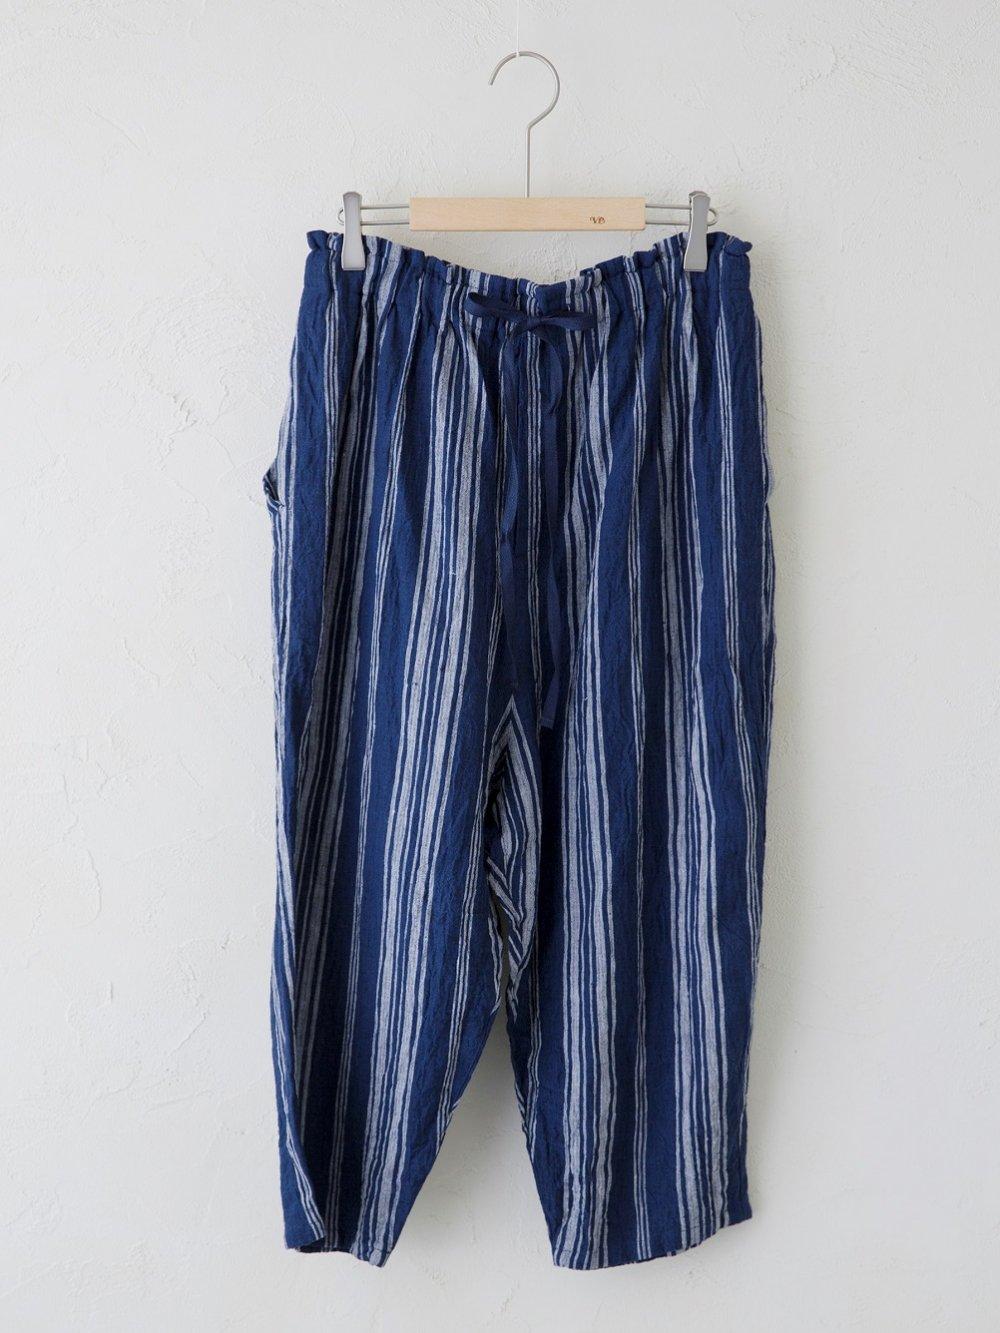 Linen Check / Stripe イージーパンツ